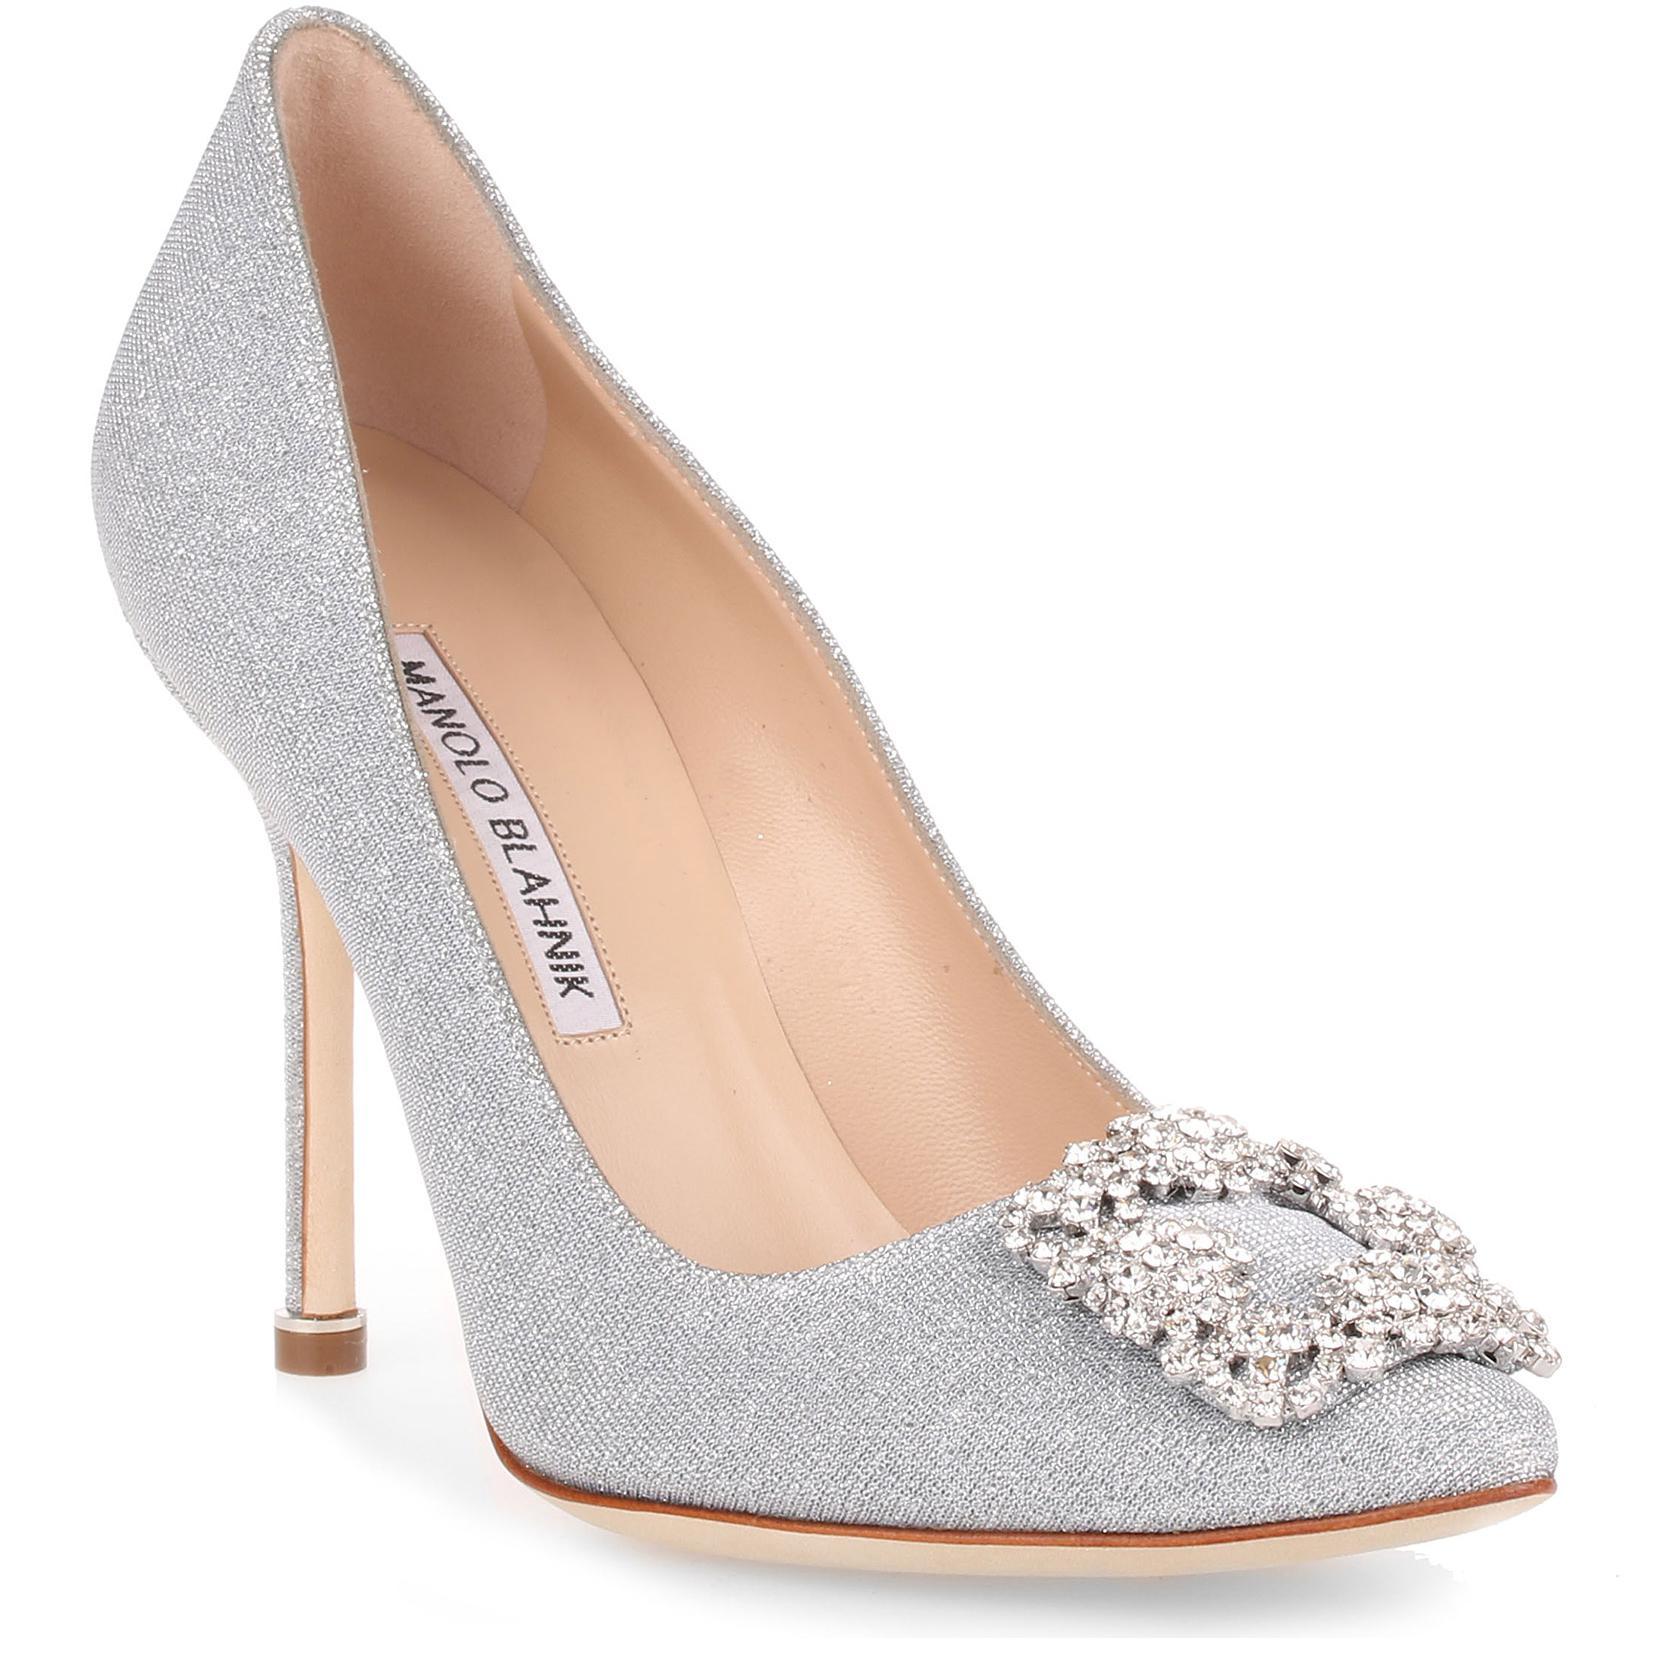 Hangisi 105 Notturno Glitter Silver Pumps Manolo Blahnik HsbEl8C